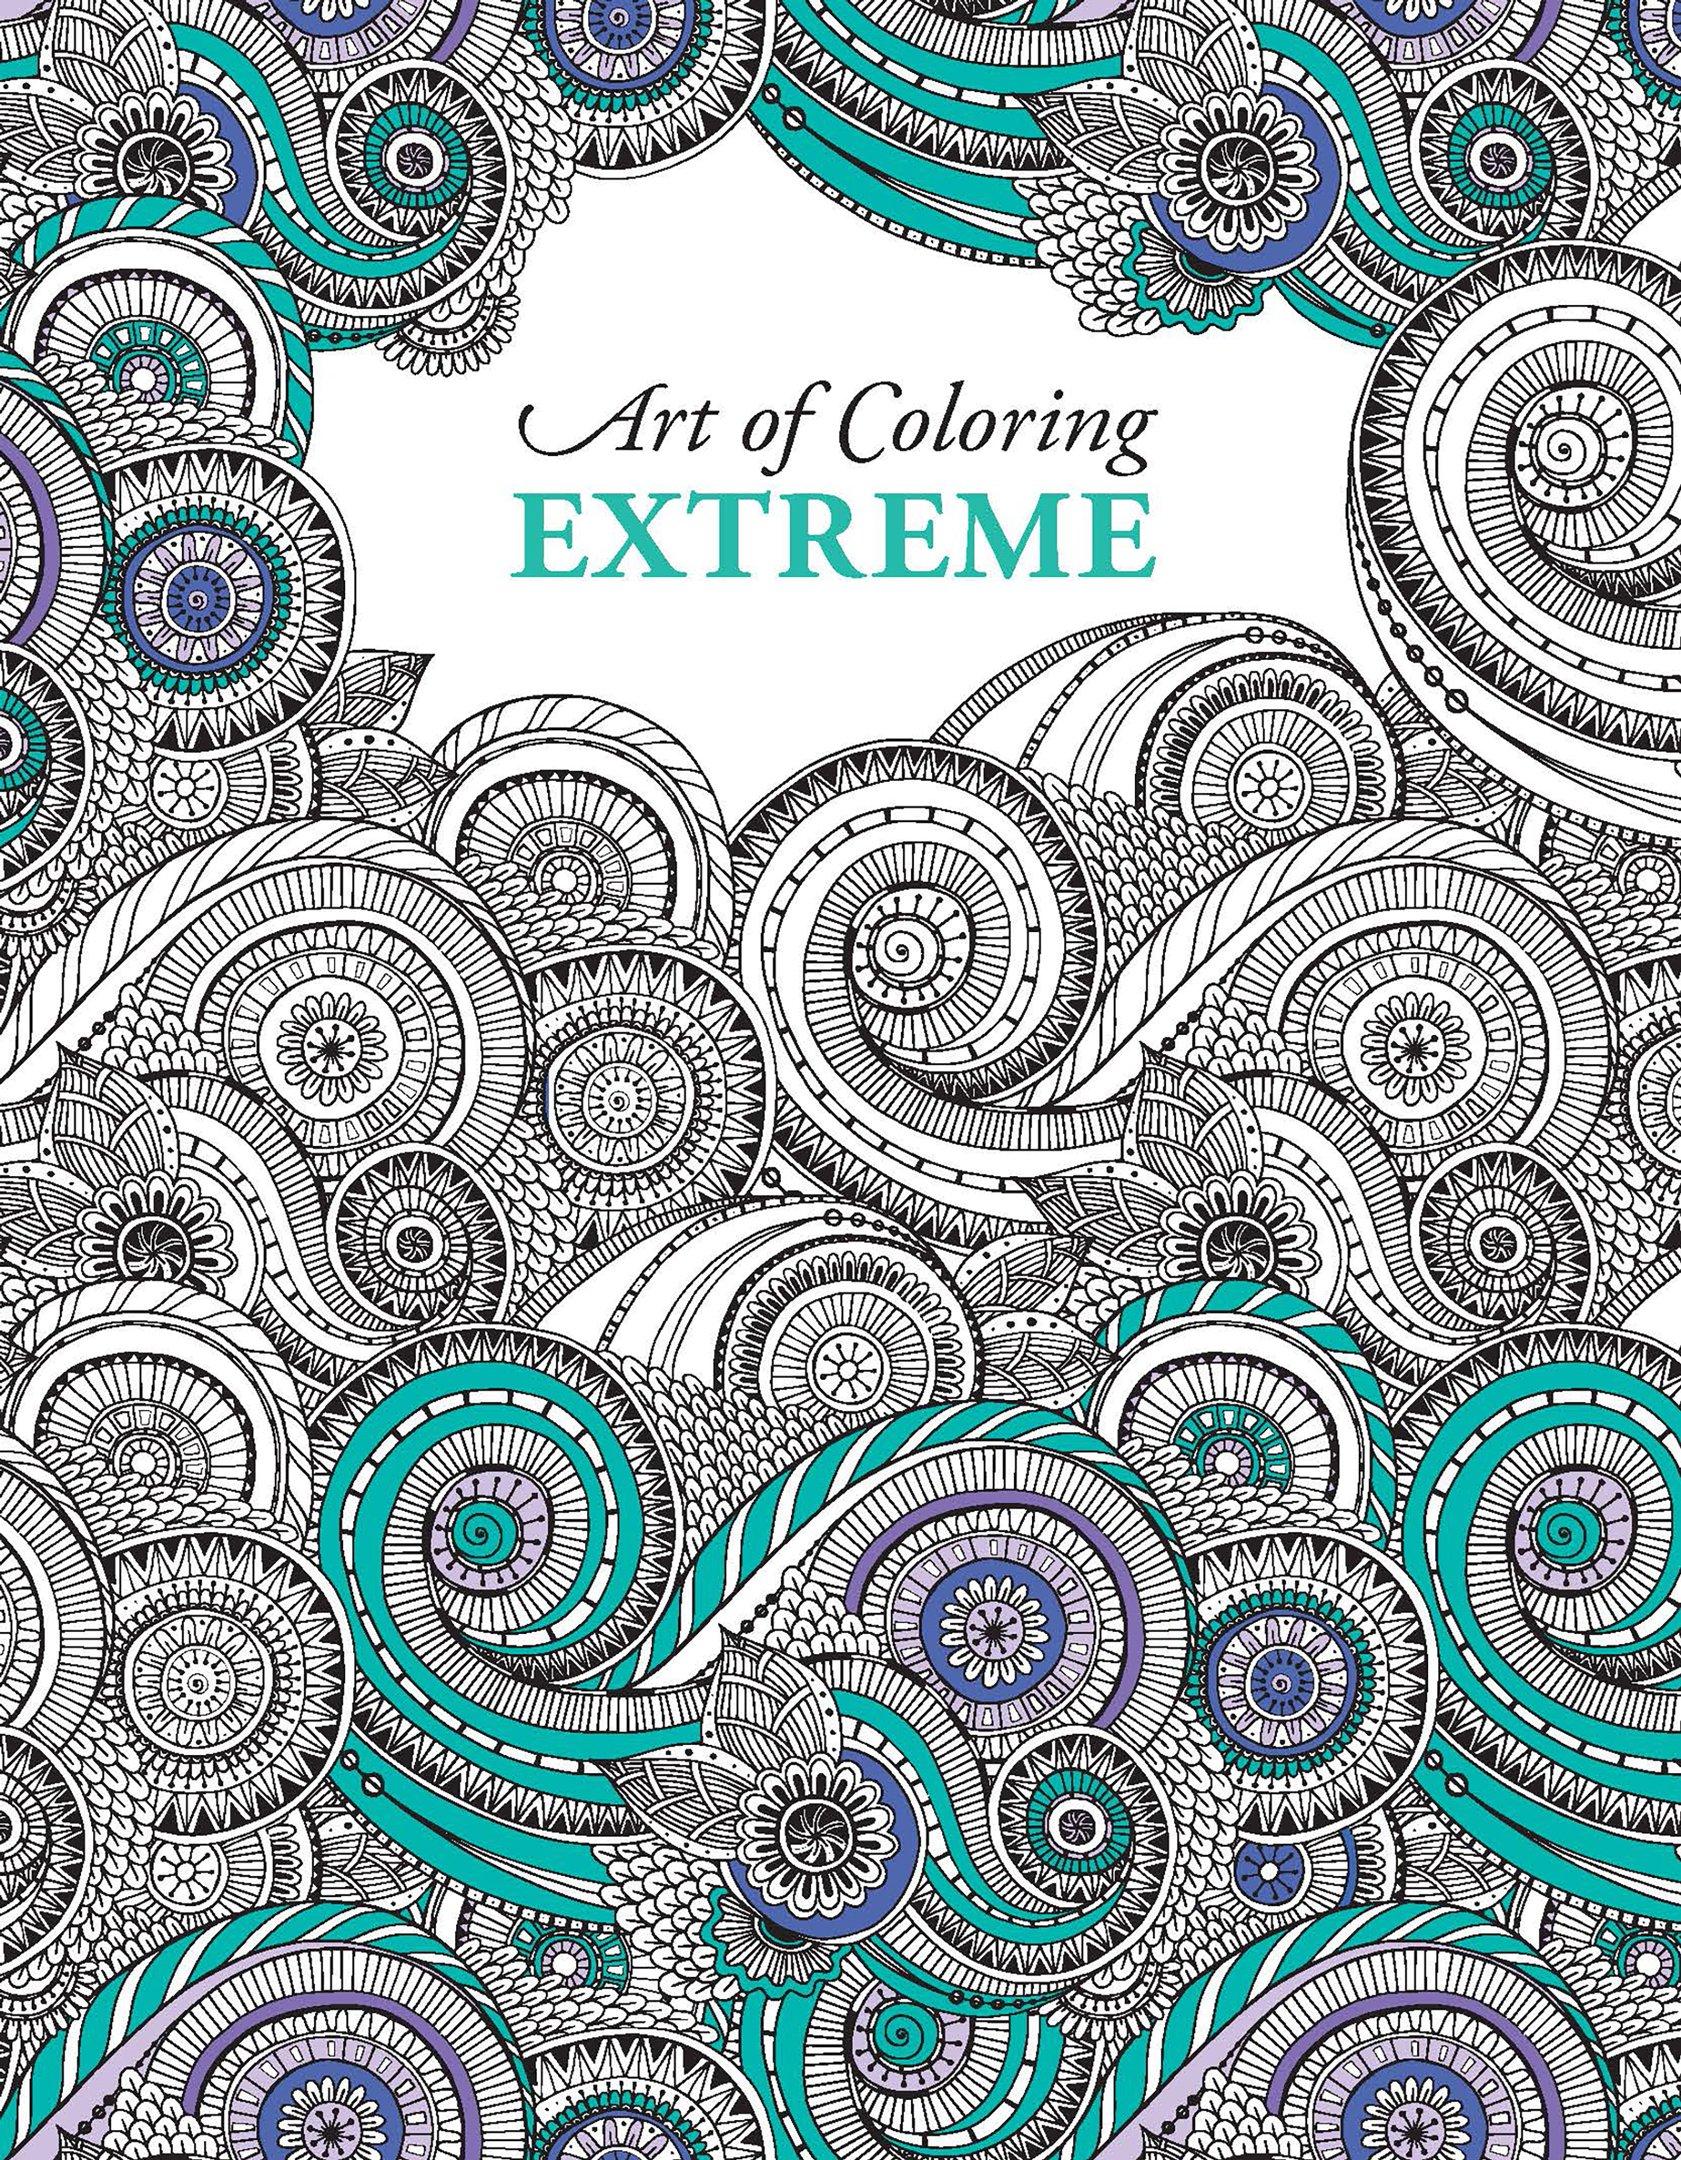 Amazon Com Art Of Coloring Extreme Leisure Arts 6902 9781464757280 Liesure Arts Books